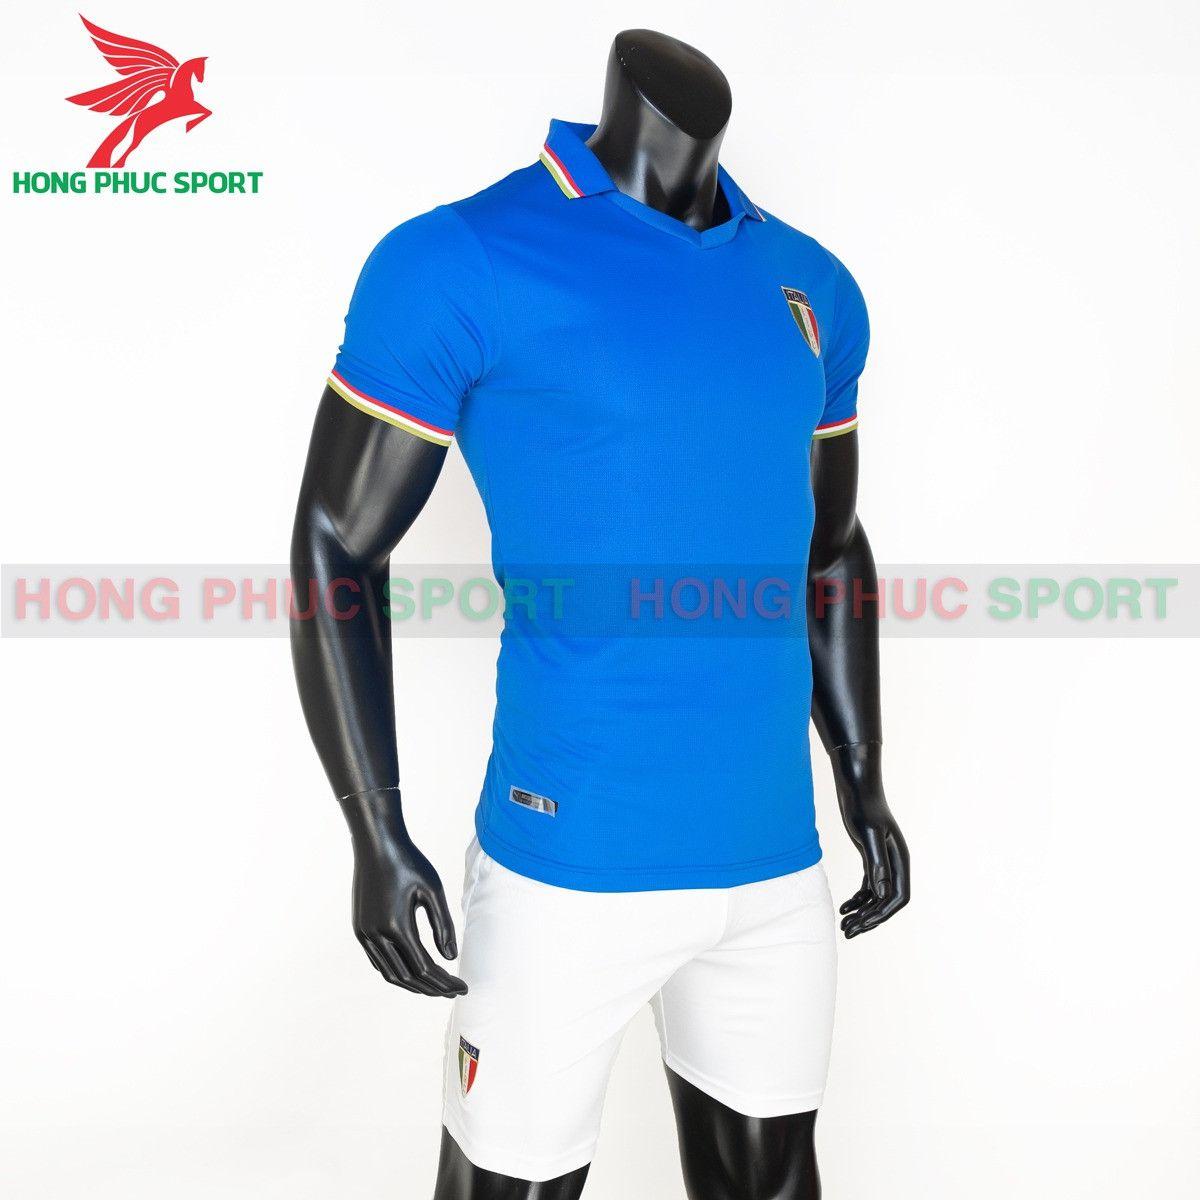 https://cdn.hongphucsport.com/unsafe/s4.shopbay.vn/files/285/ao-dau-tuyen-italy-2021-san-nha-thailand-3-614ae2ba37669.jpg